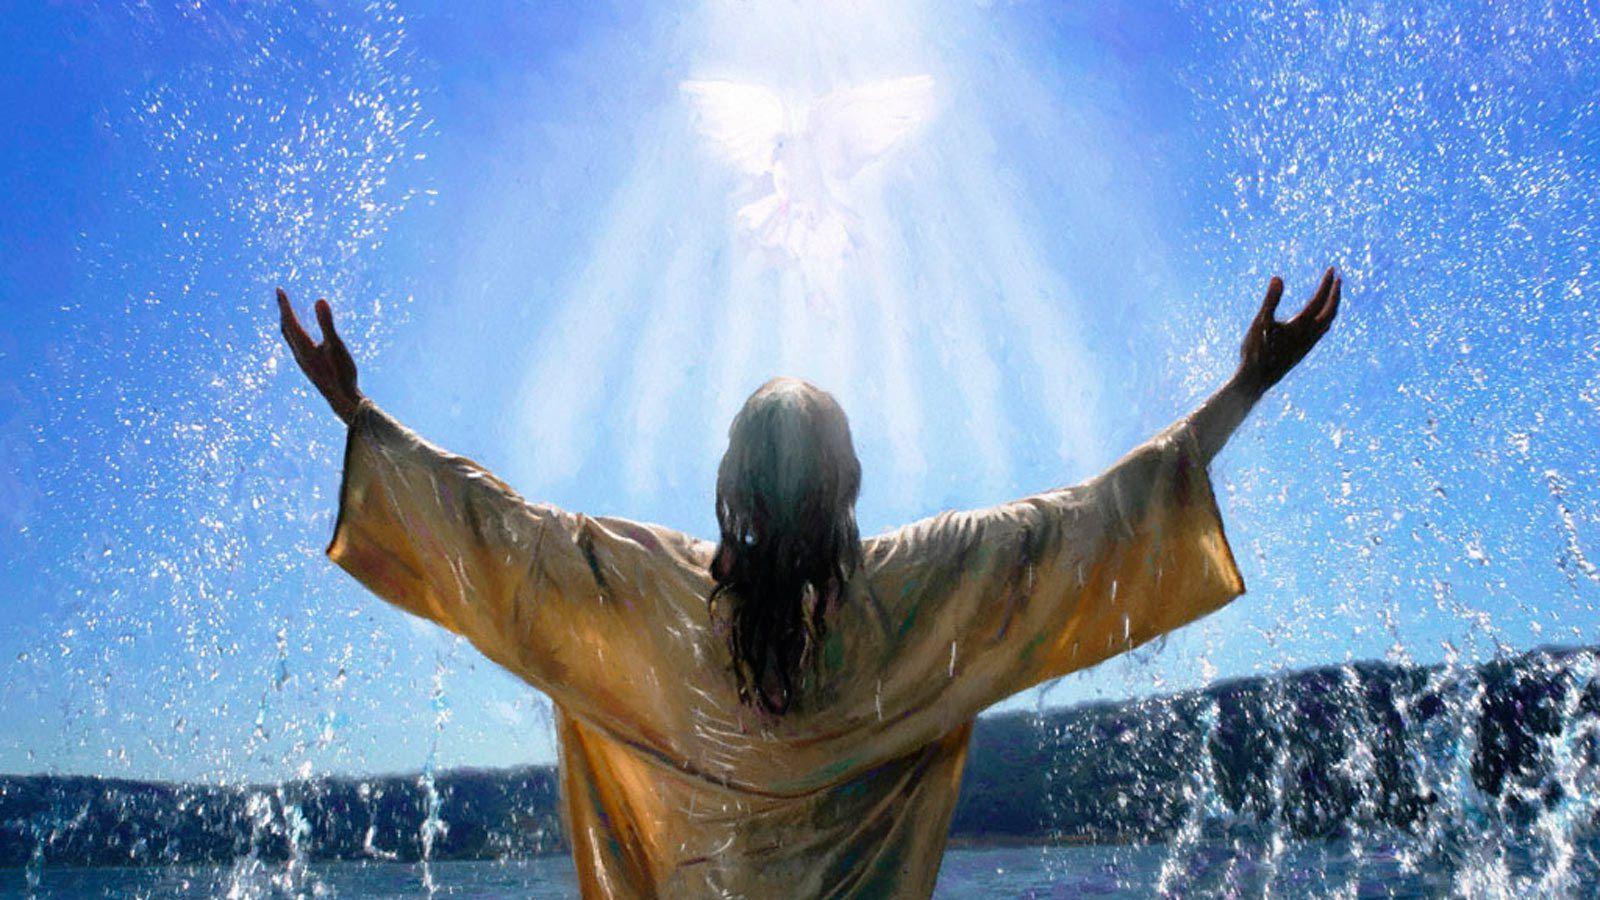 Bautismo Cristiano 的图片搜索结果 Jesus Christ Images Jesus